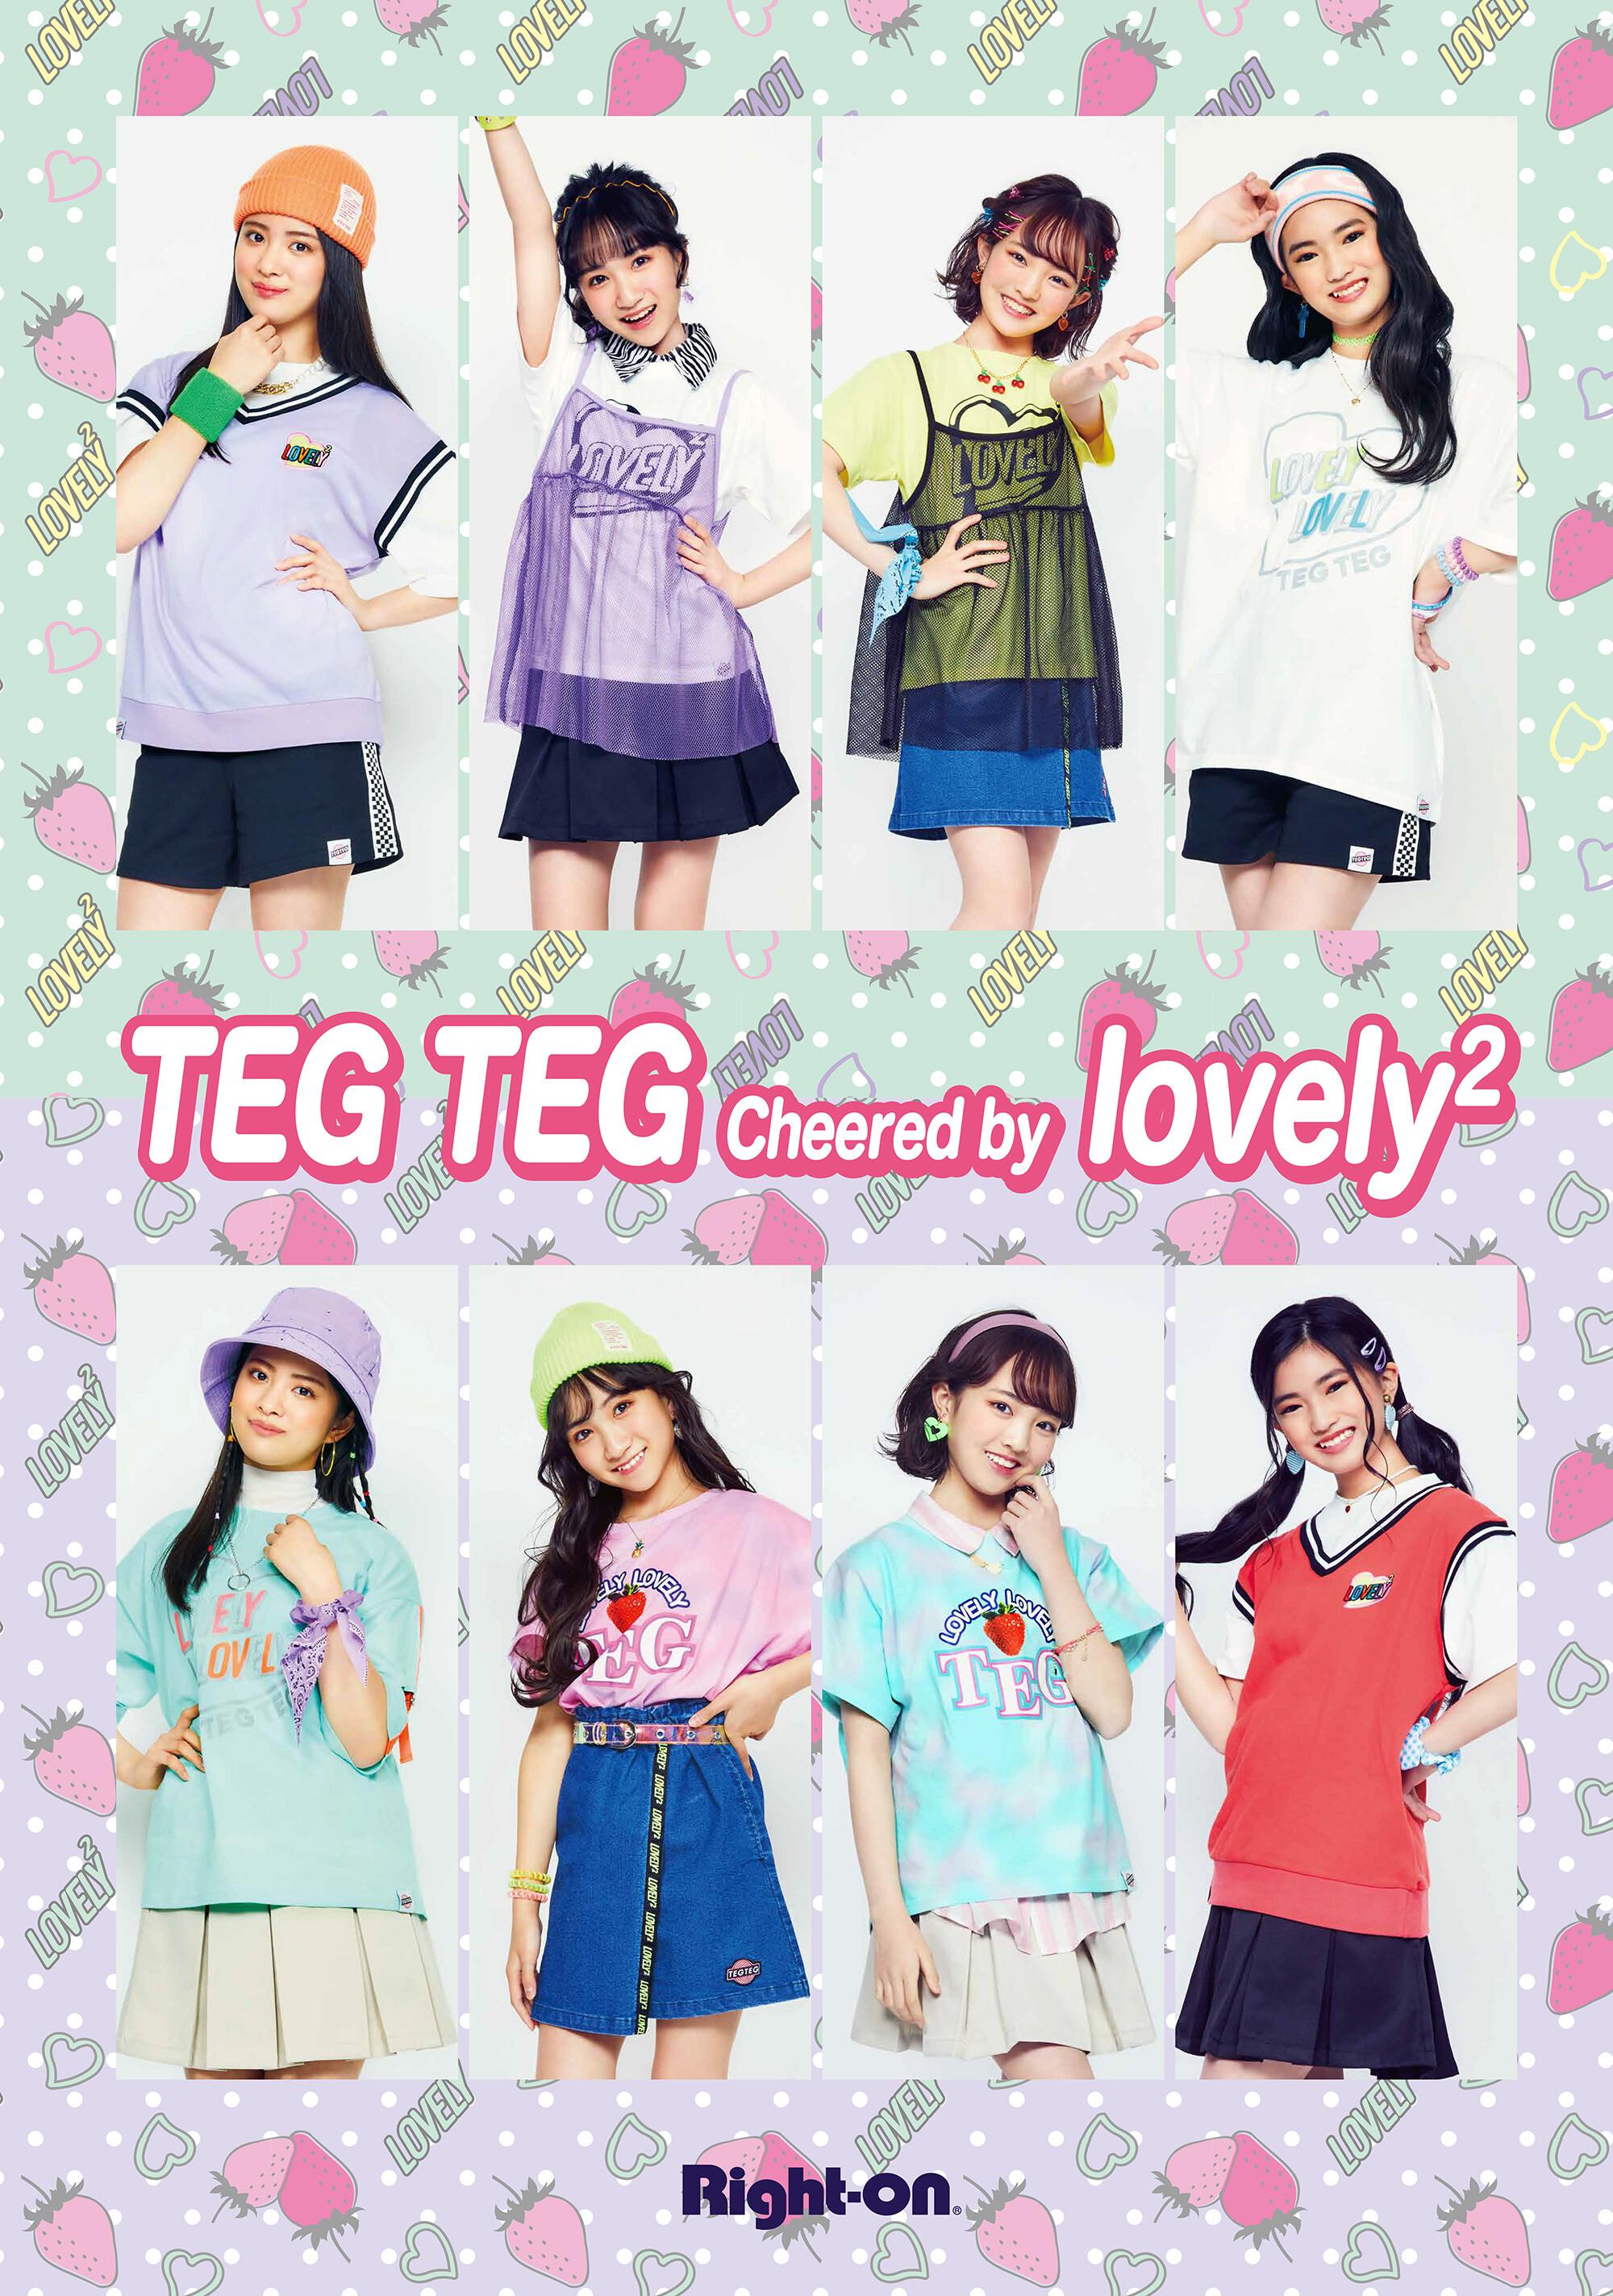 TEG TEG cheered by lovely²コラボアイテム第2弾の店頭販売がスタート!